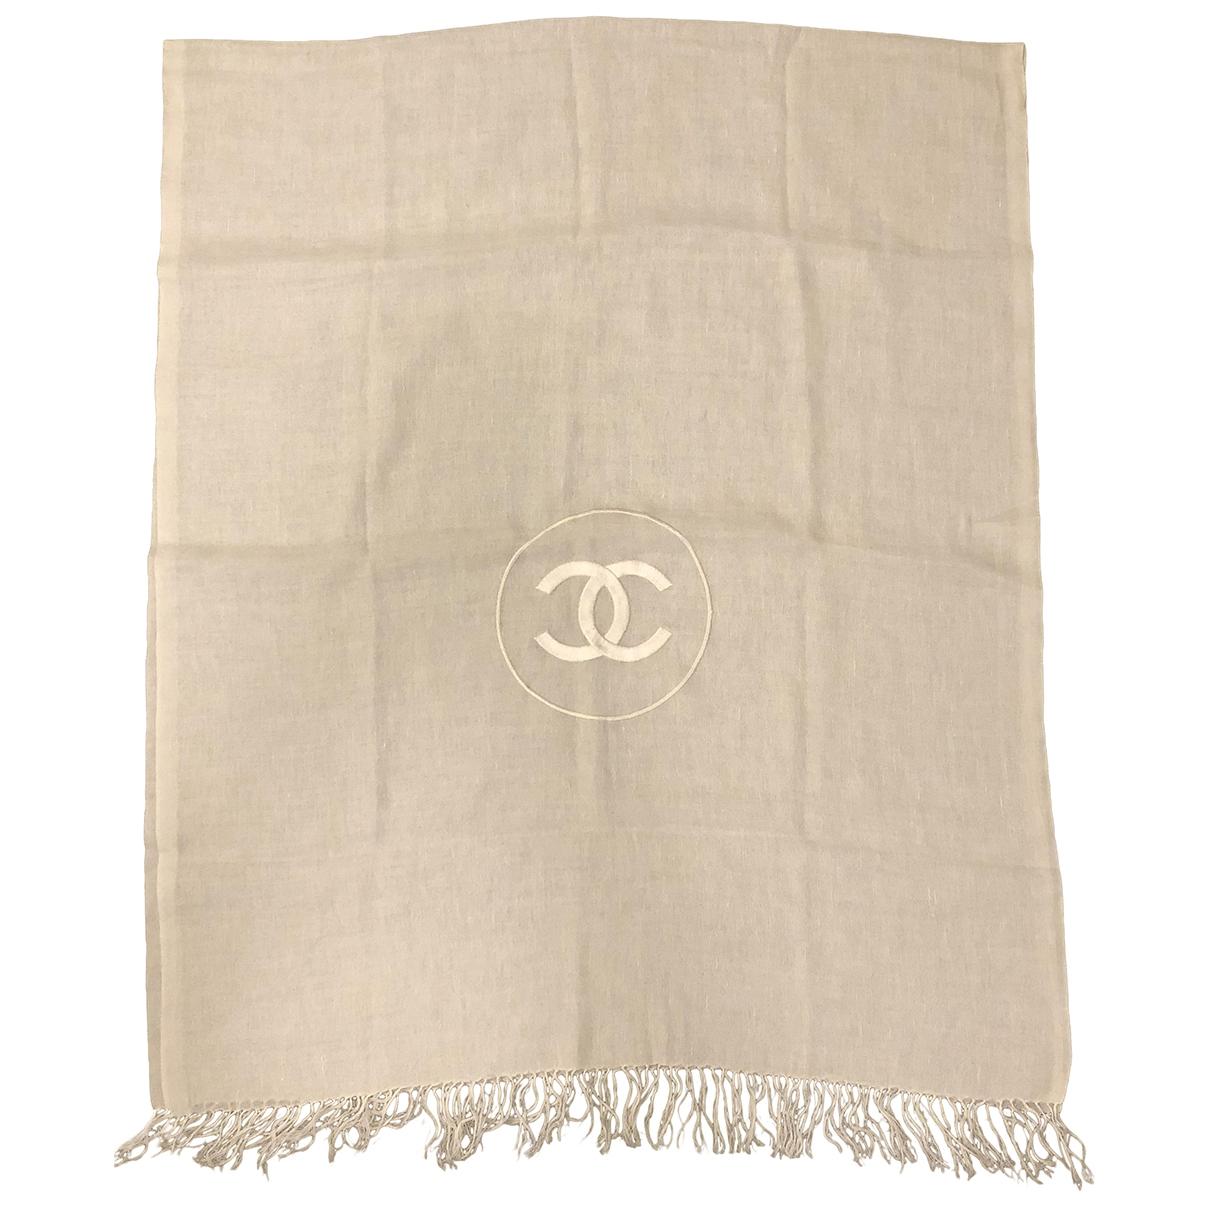 Estola de Cachemira Chanel